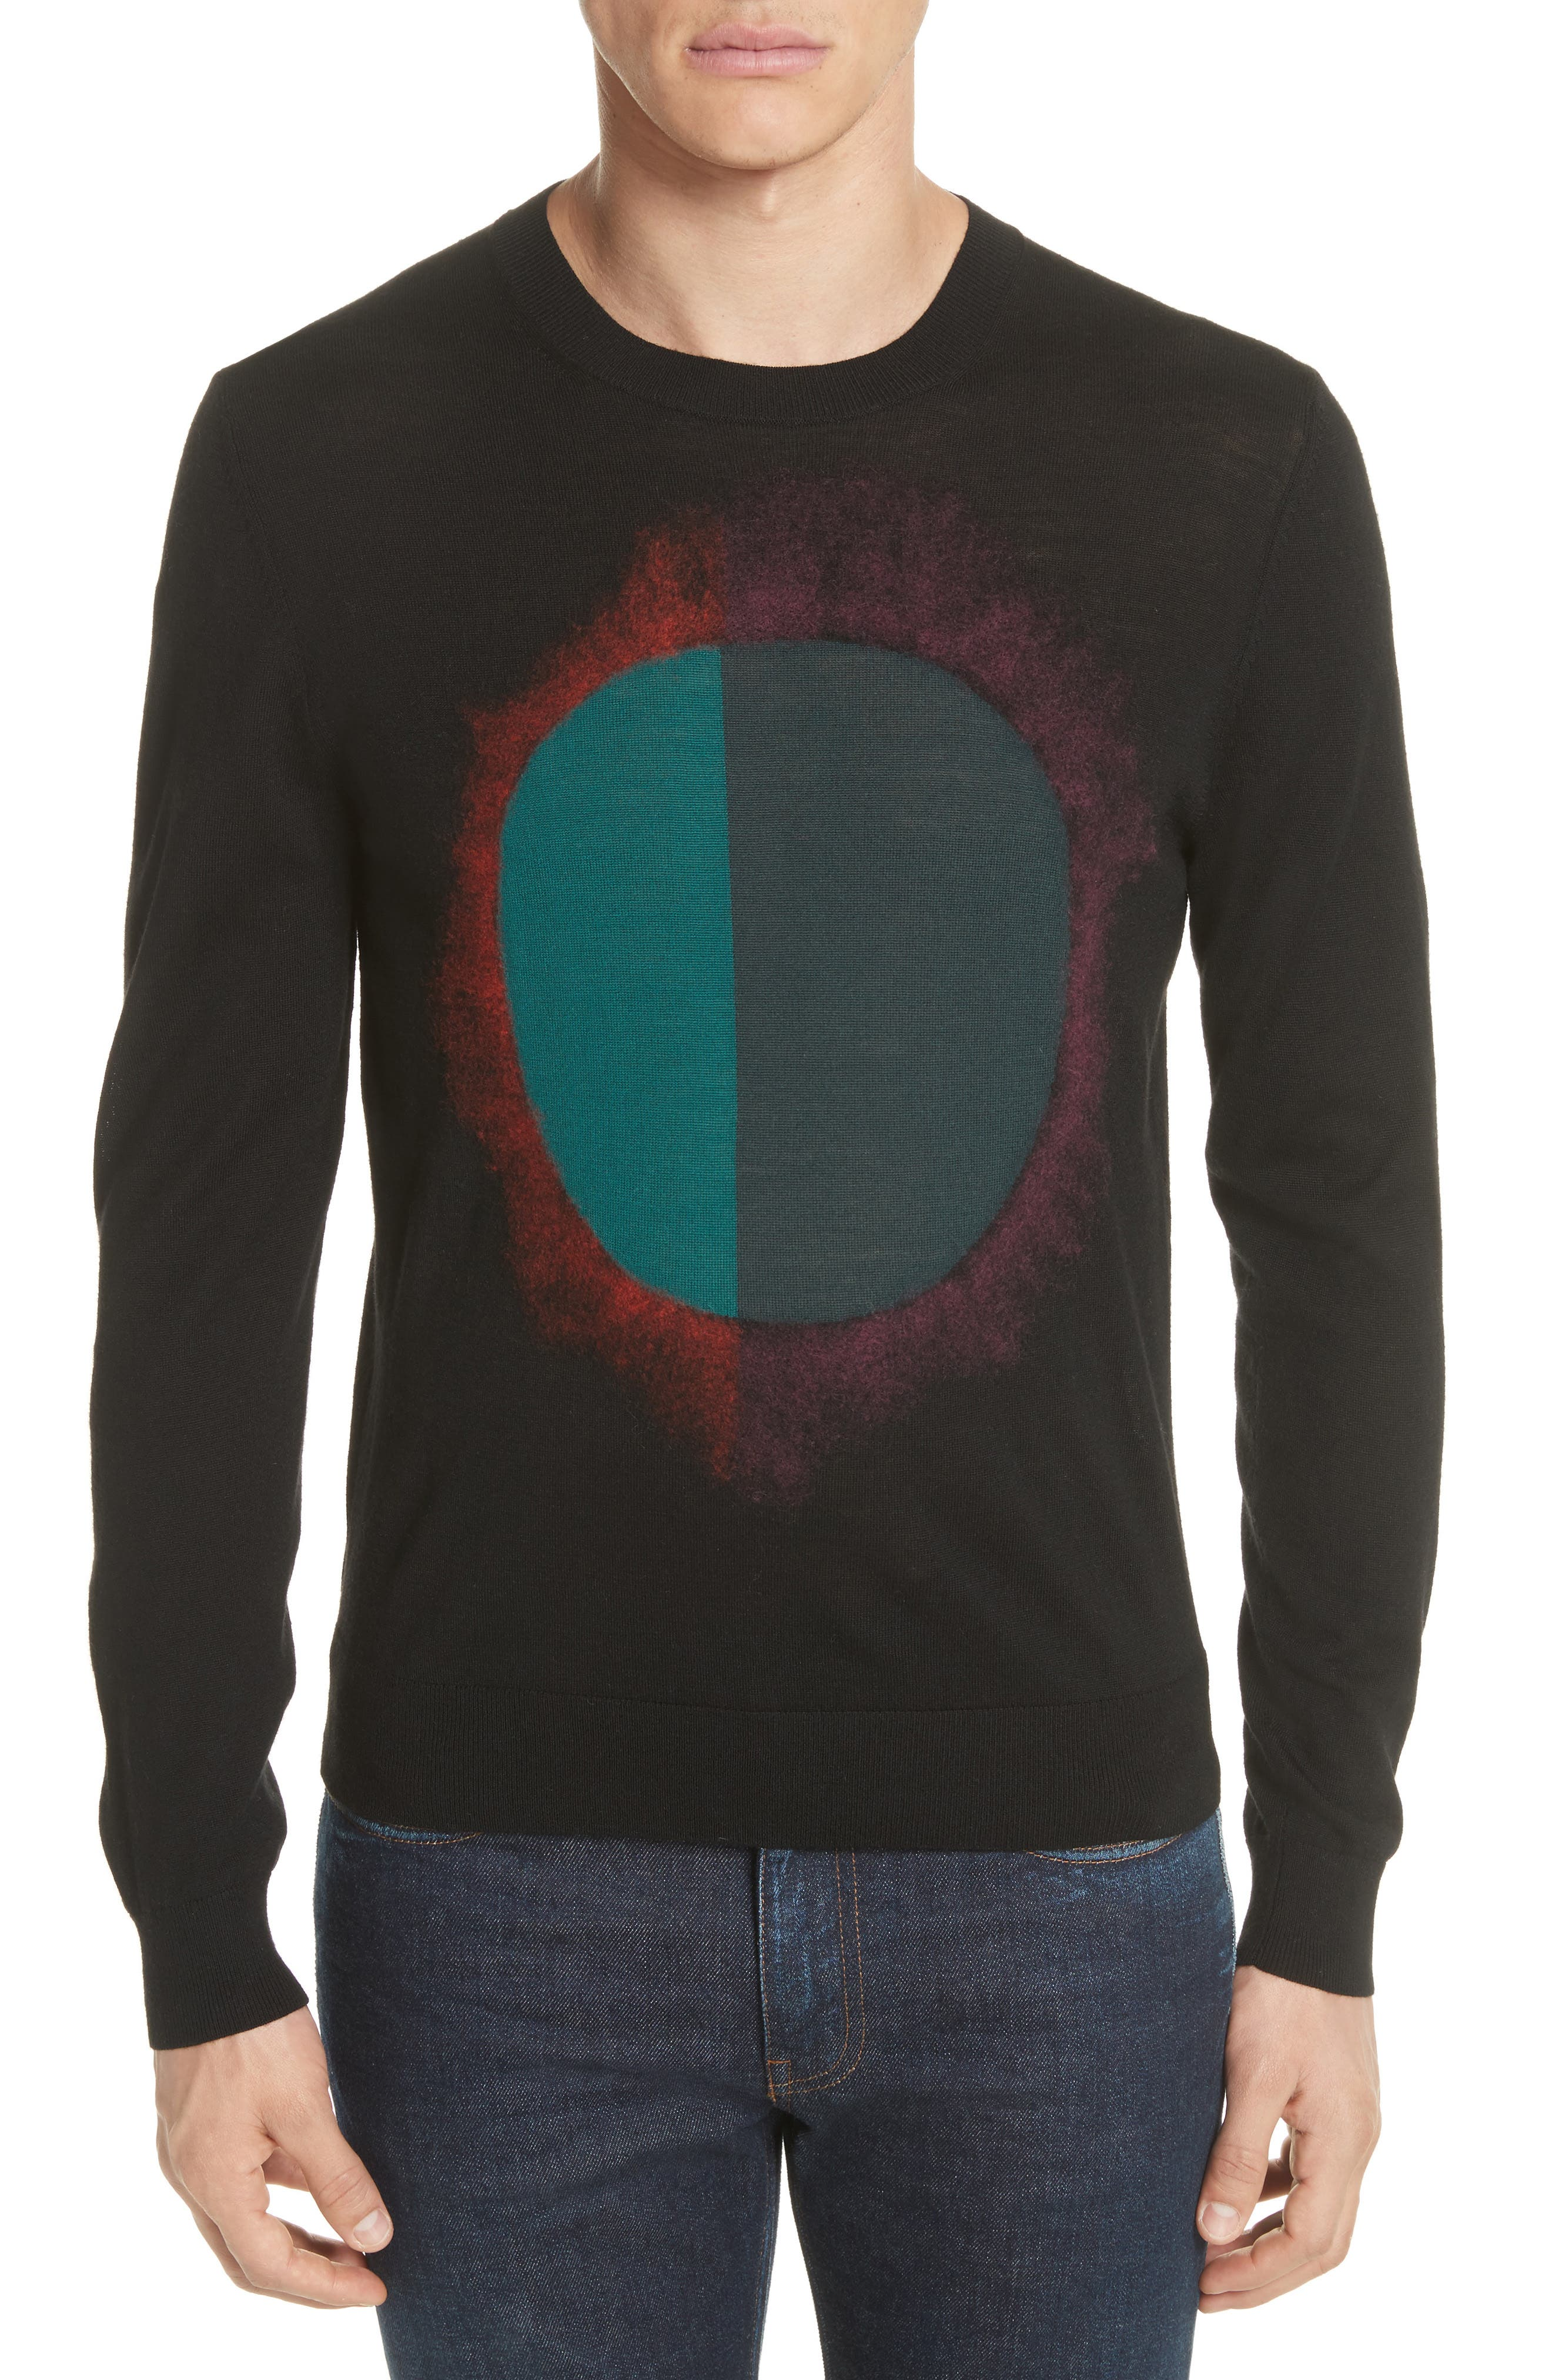 Circle Merino Wool Blend Sweater,                             Main thumbnail 1, color,                             001